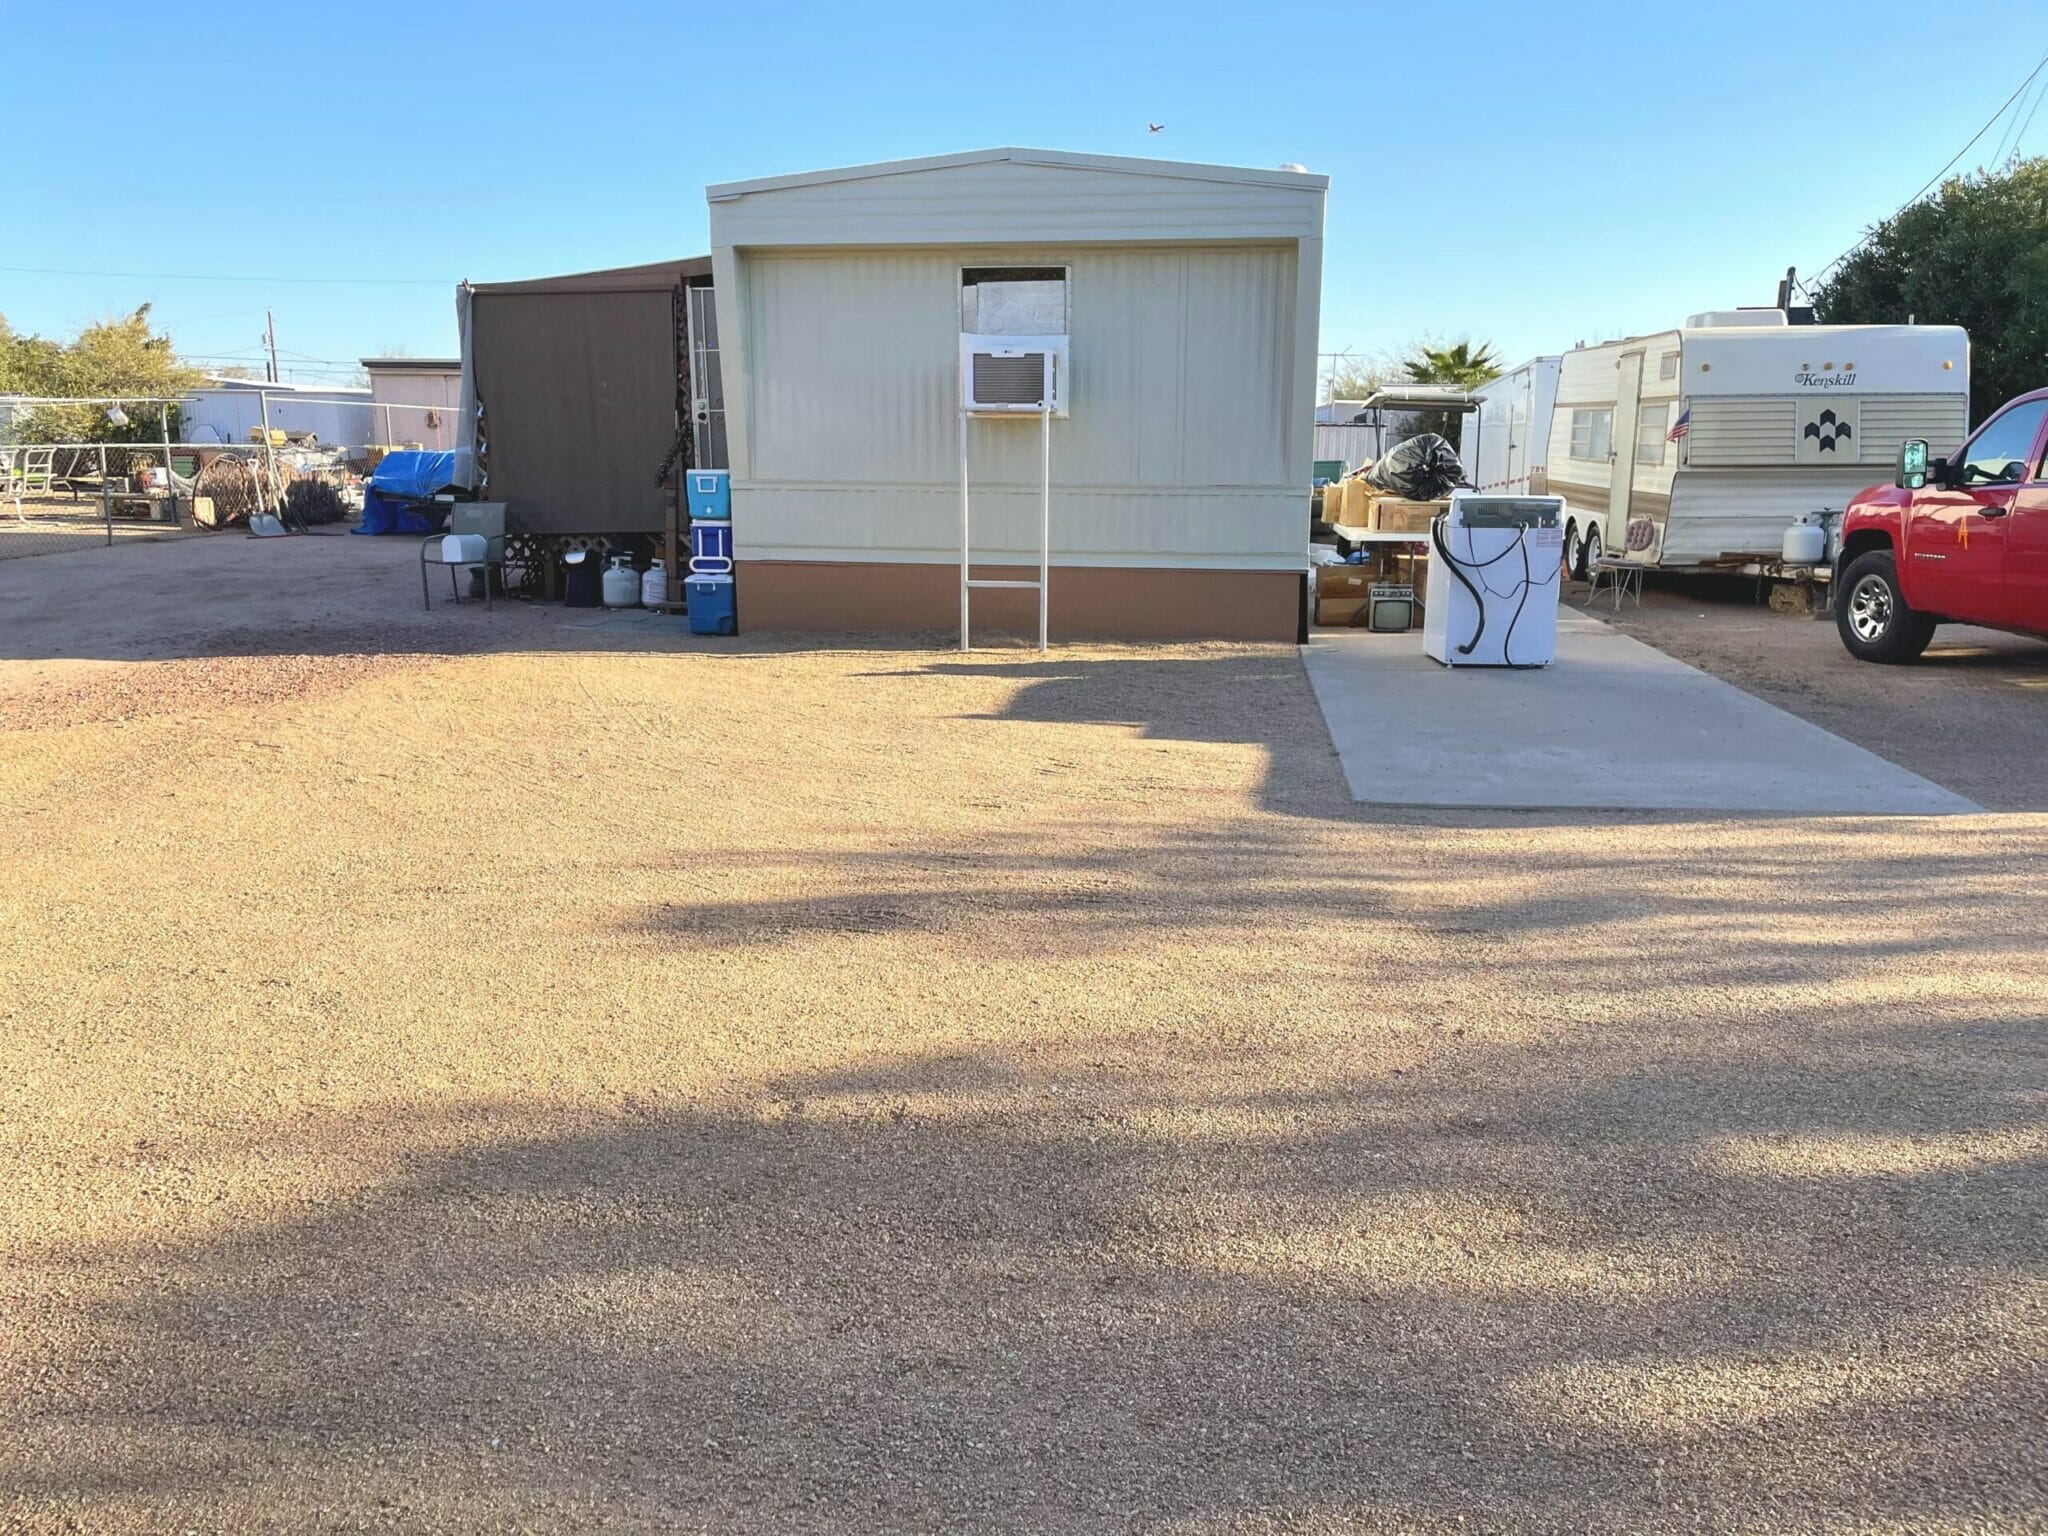 1154 S Cedar Dr, Apache Junction, AZ 85120